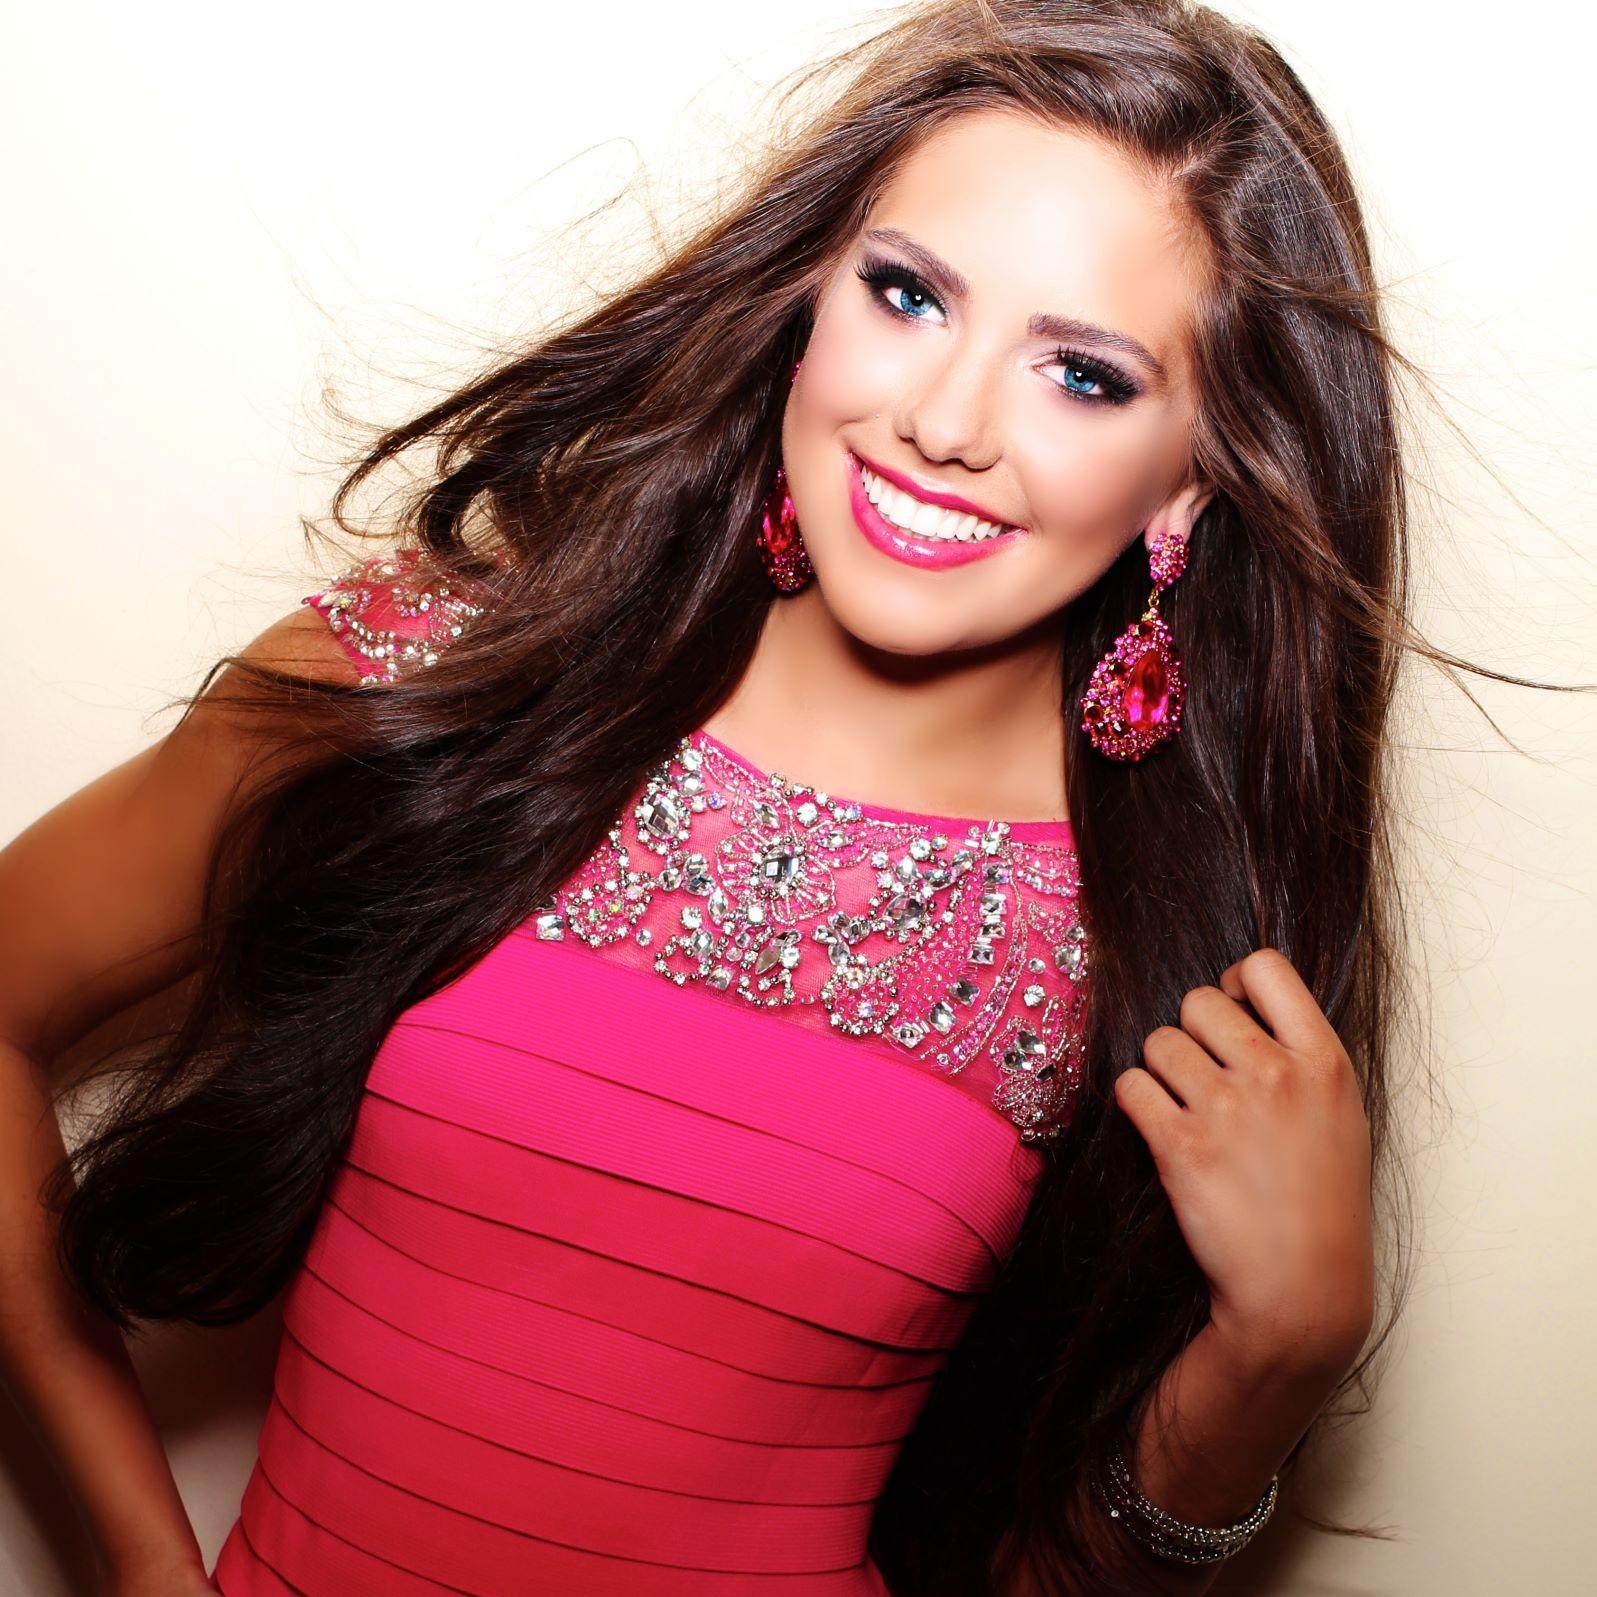 VIDEO: Olivia Argue – Miss Arizona Teen USA 2013